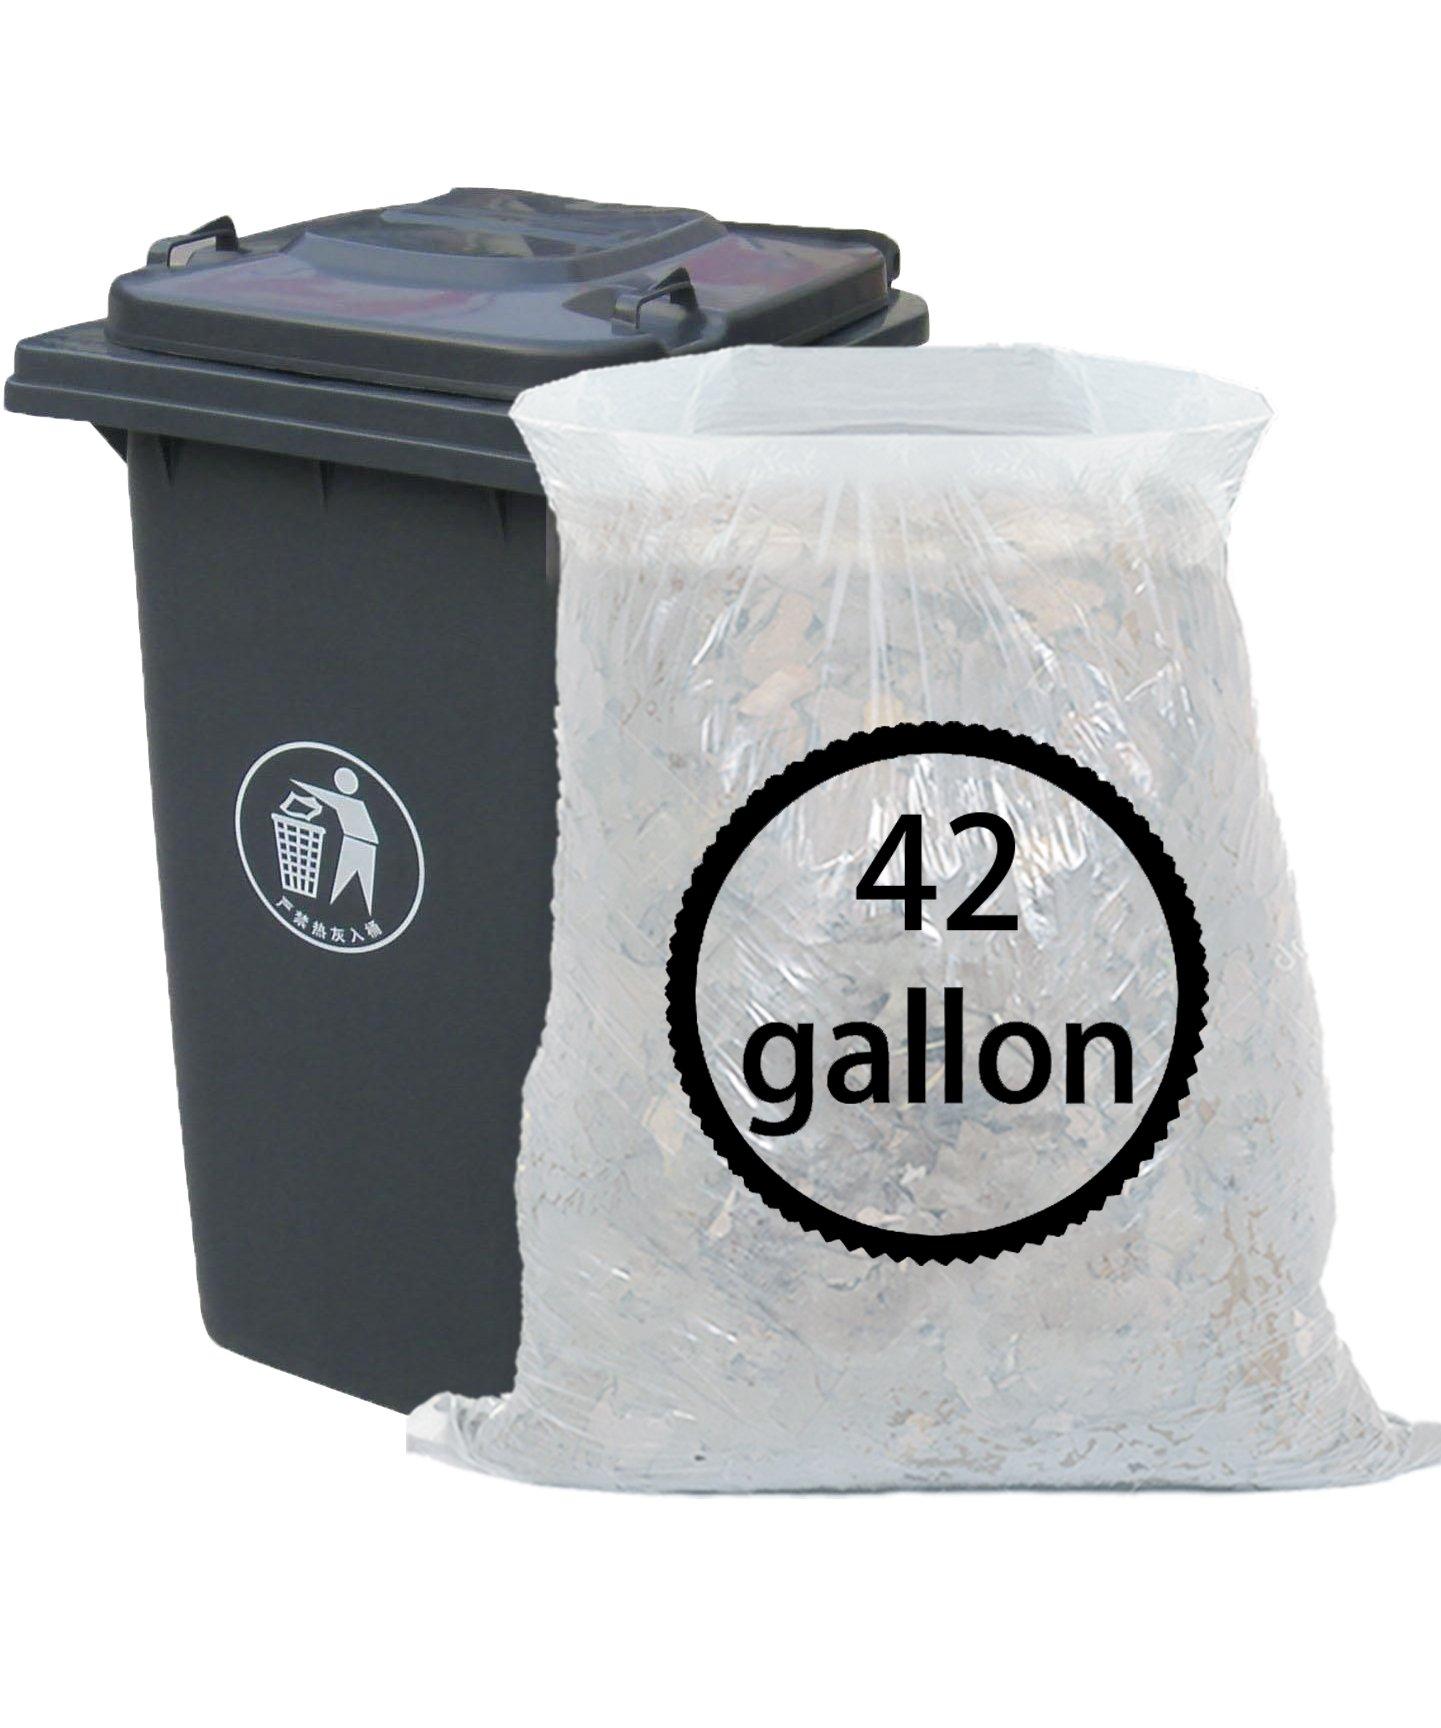 Ggbin 42 Gallon Large Trash Bags, White, 65 Counts